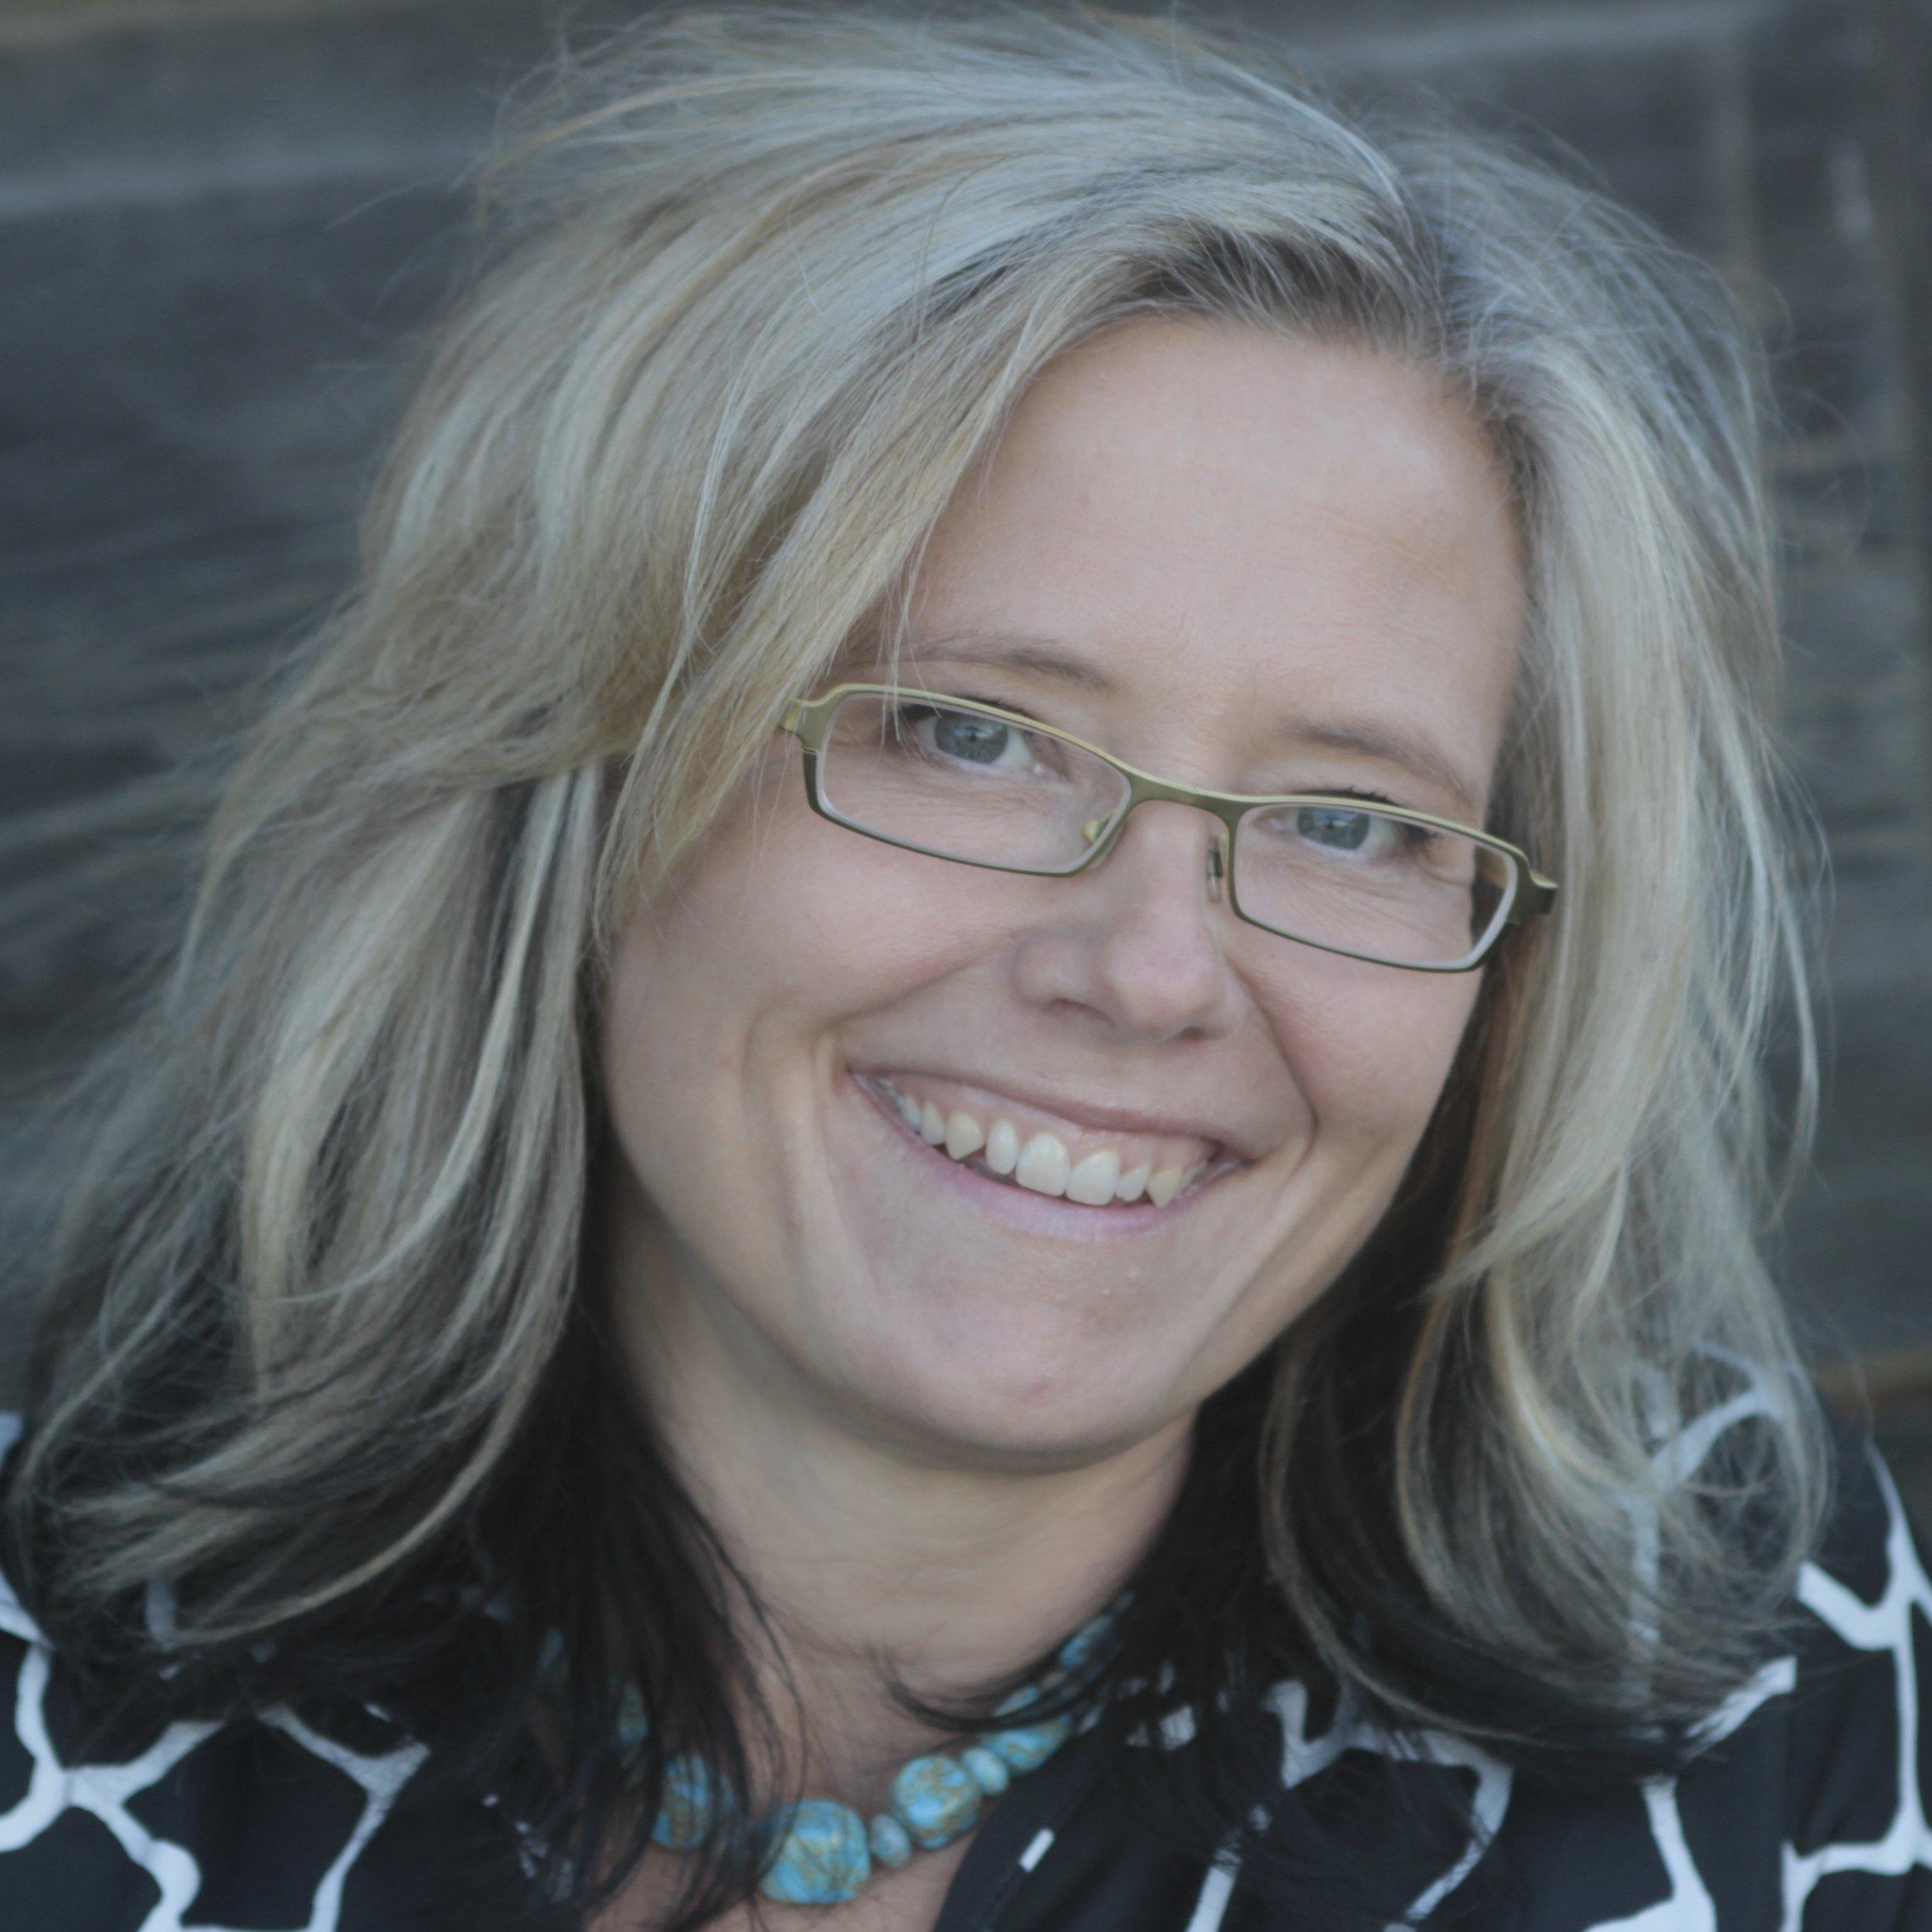 Anastasia Brencick - Contributor, Founding Member